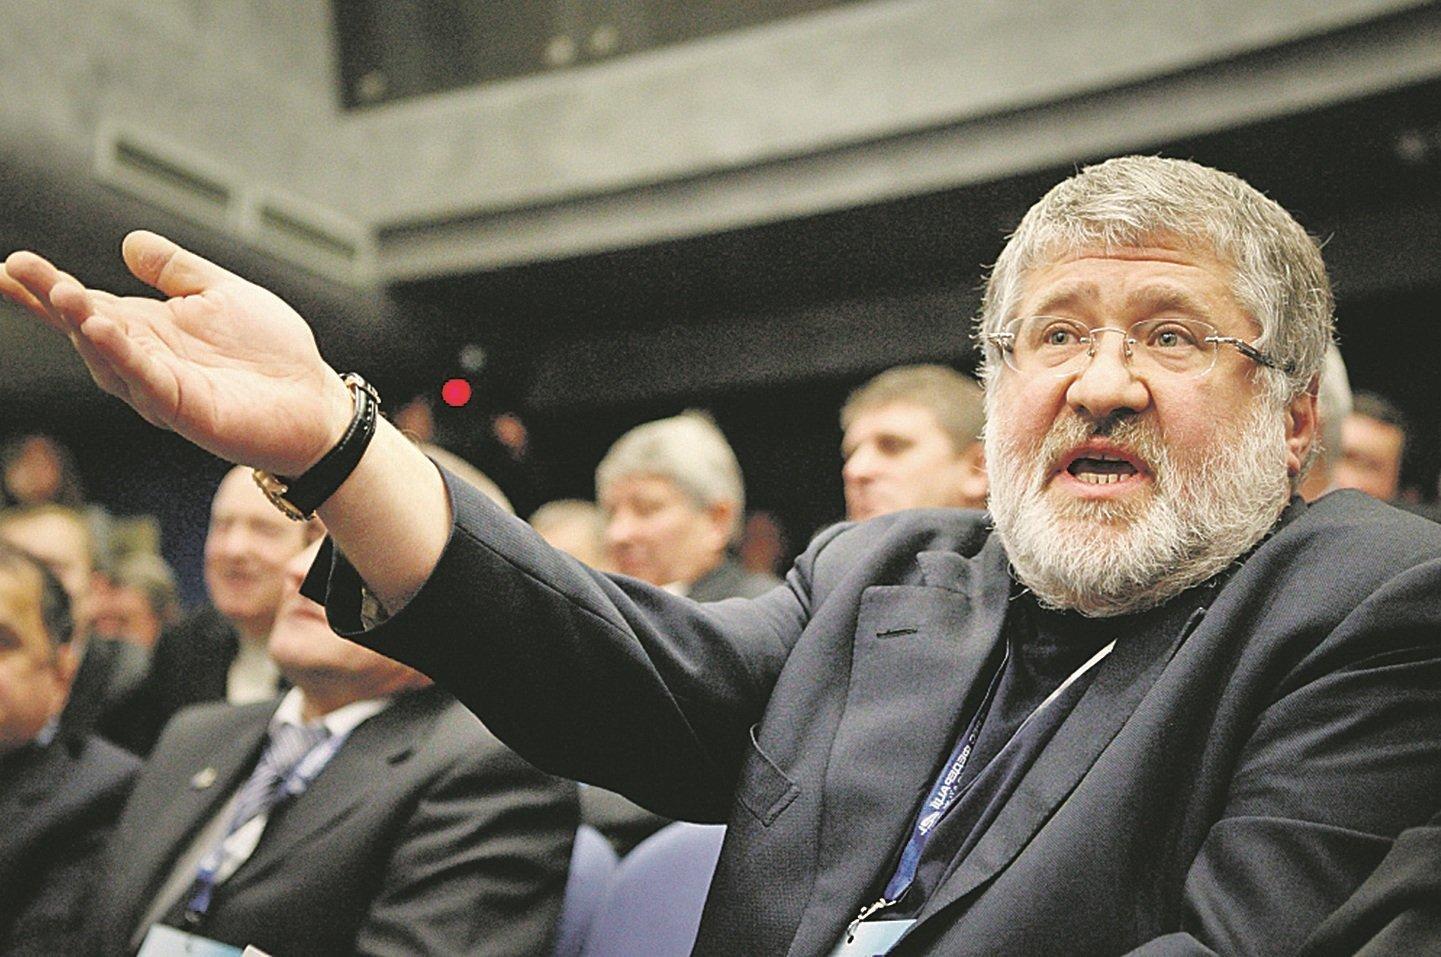 Украина, Политика, Коломойский, Олигарх, Экономика, Газ, Россия.